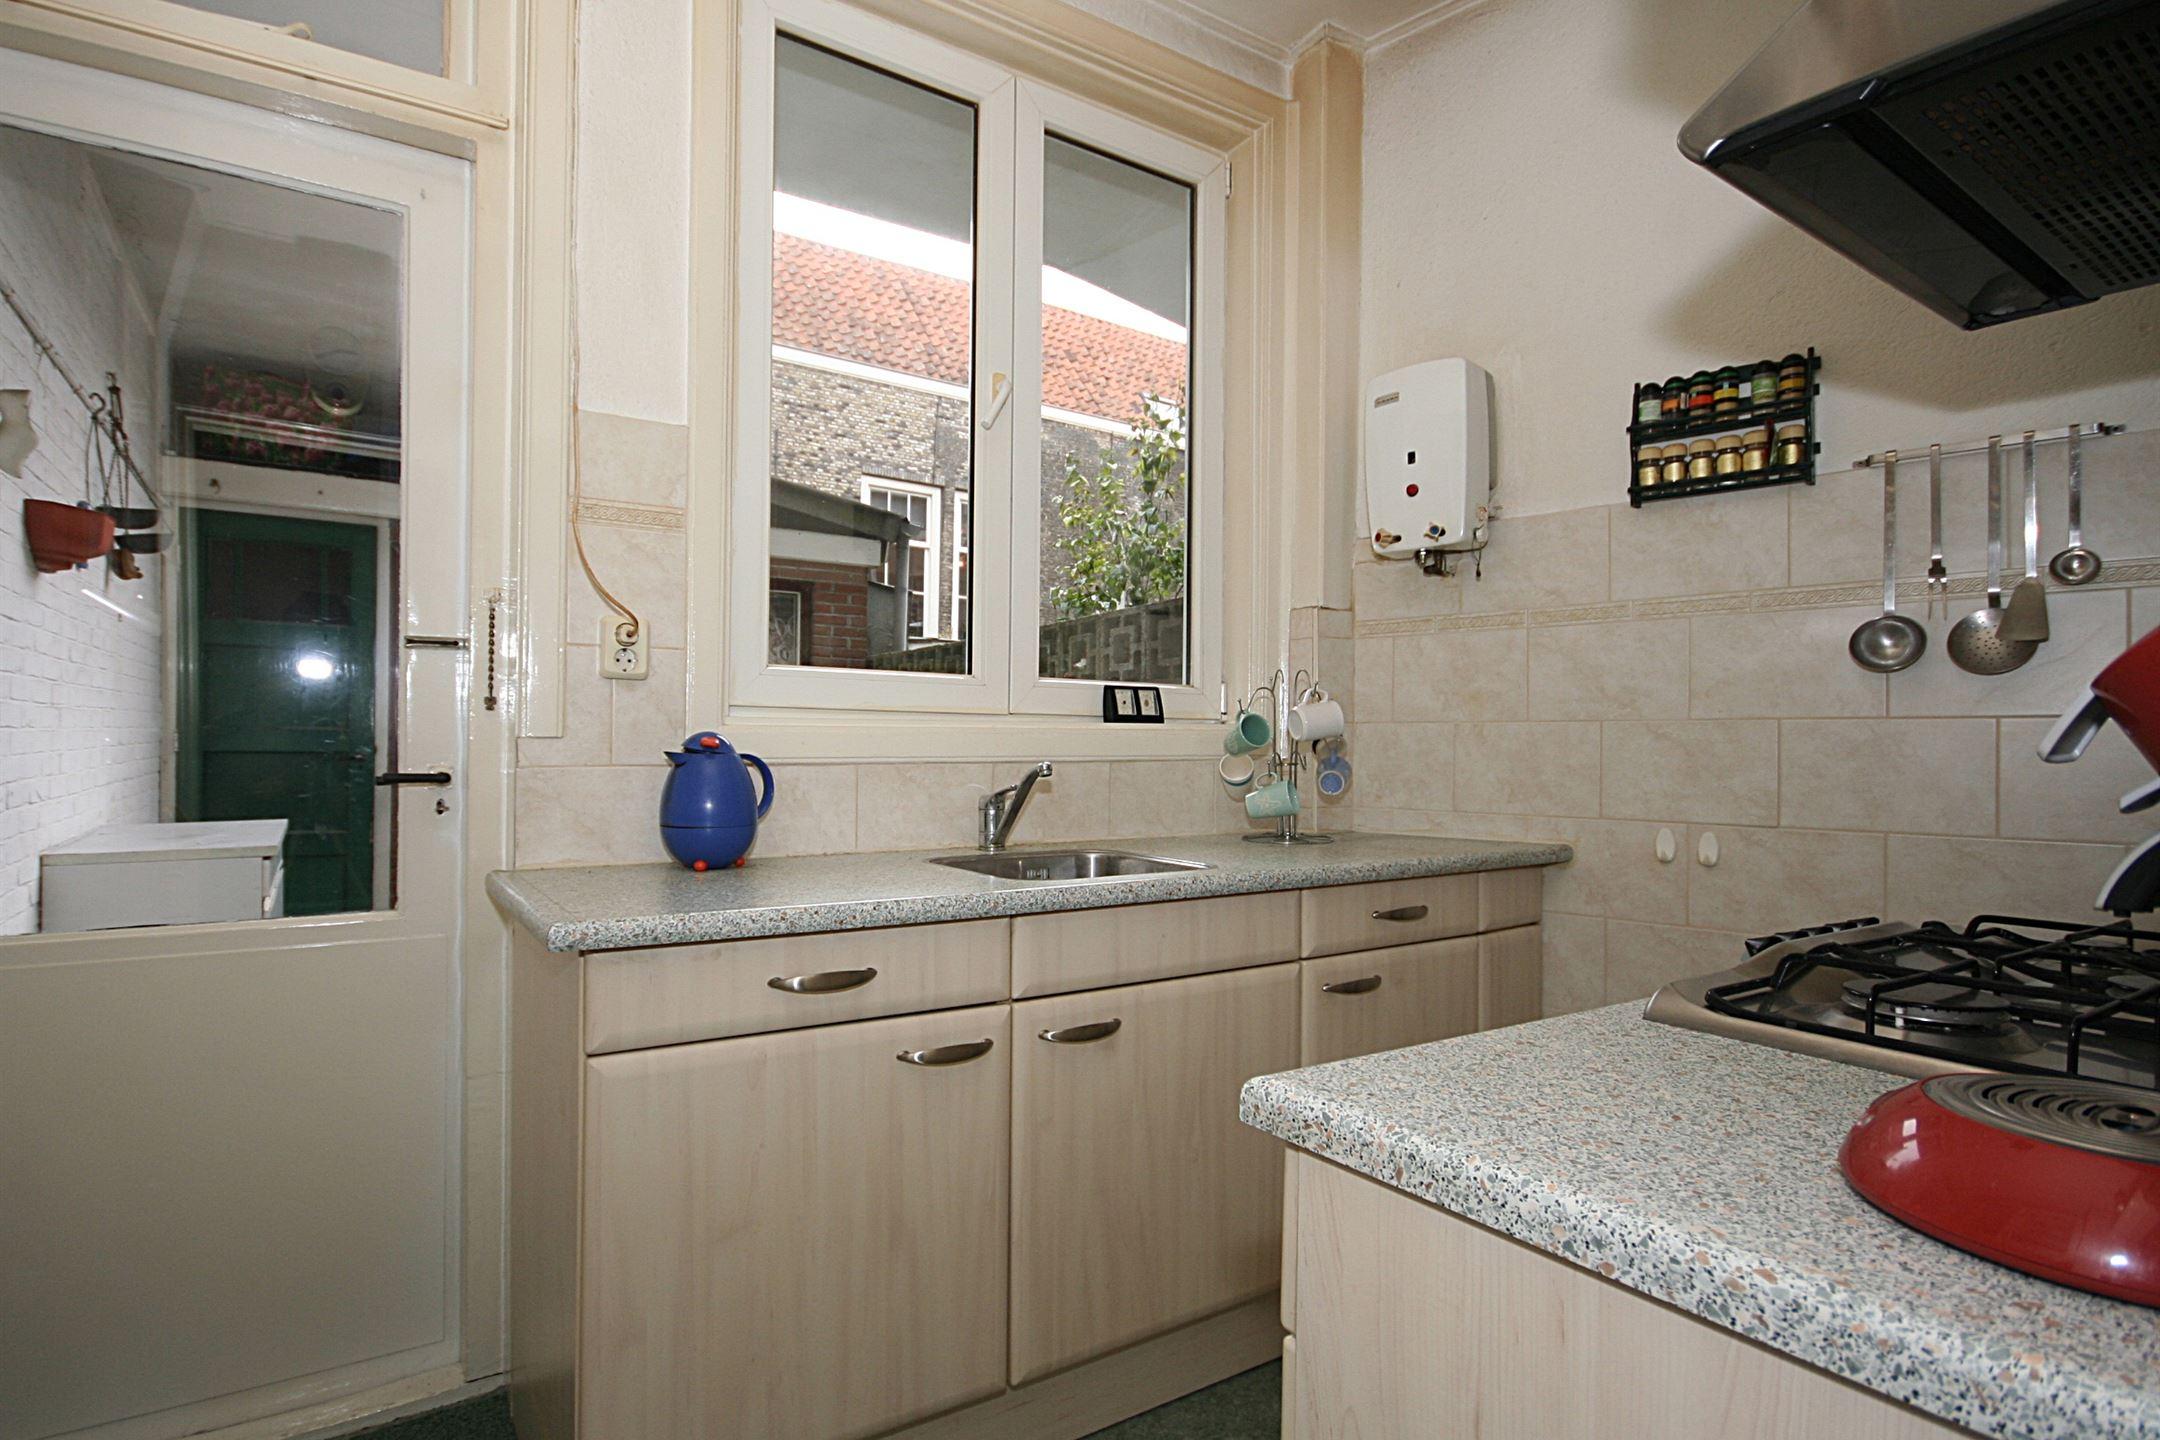 Verkocht elfhuizen 1 3311 vg dordrecht funda - Keuken centraal eiland goedkoop ...